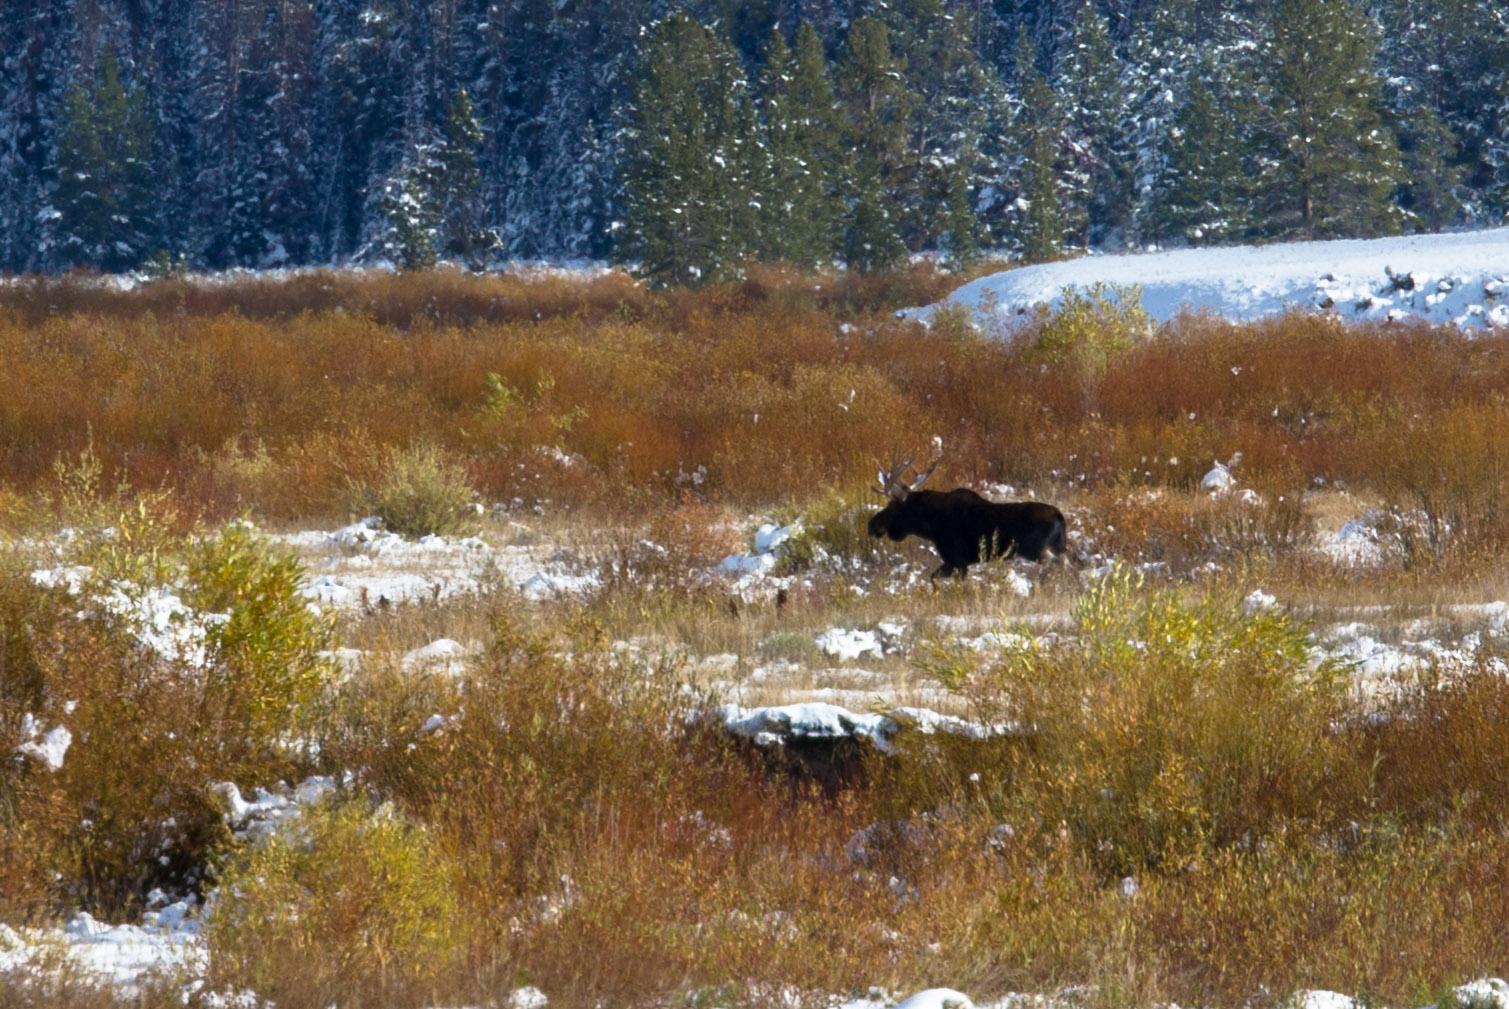 A Moose in Yellowstone